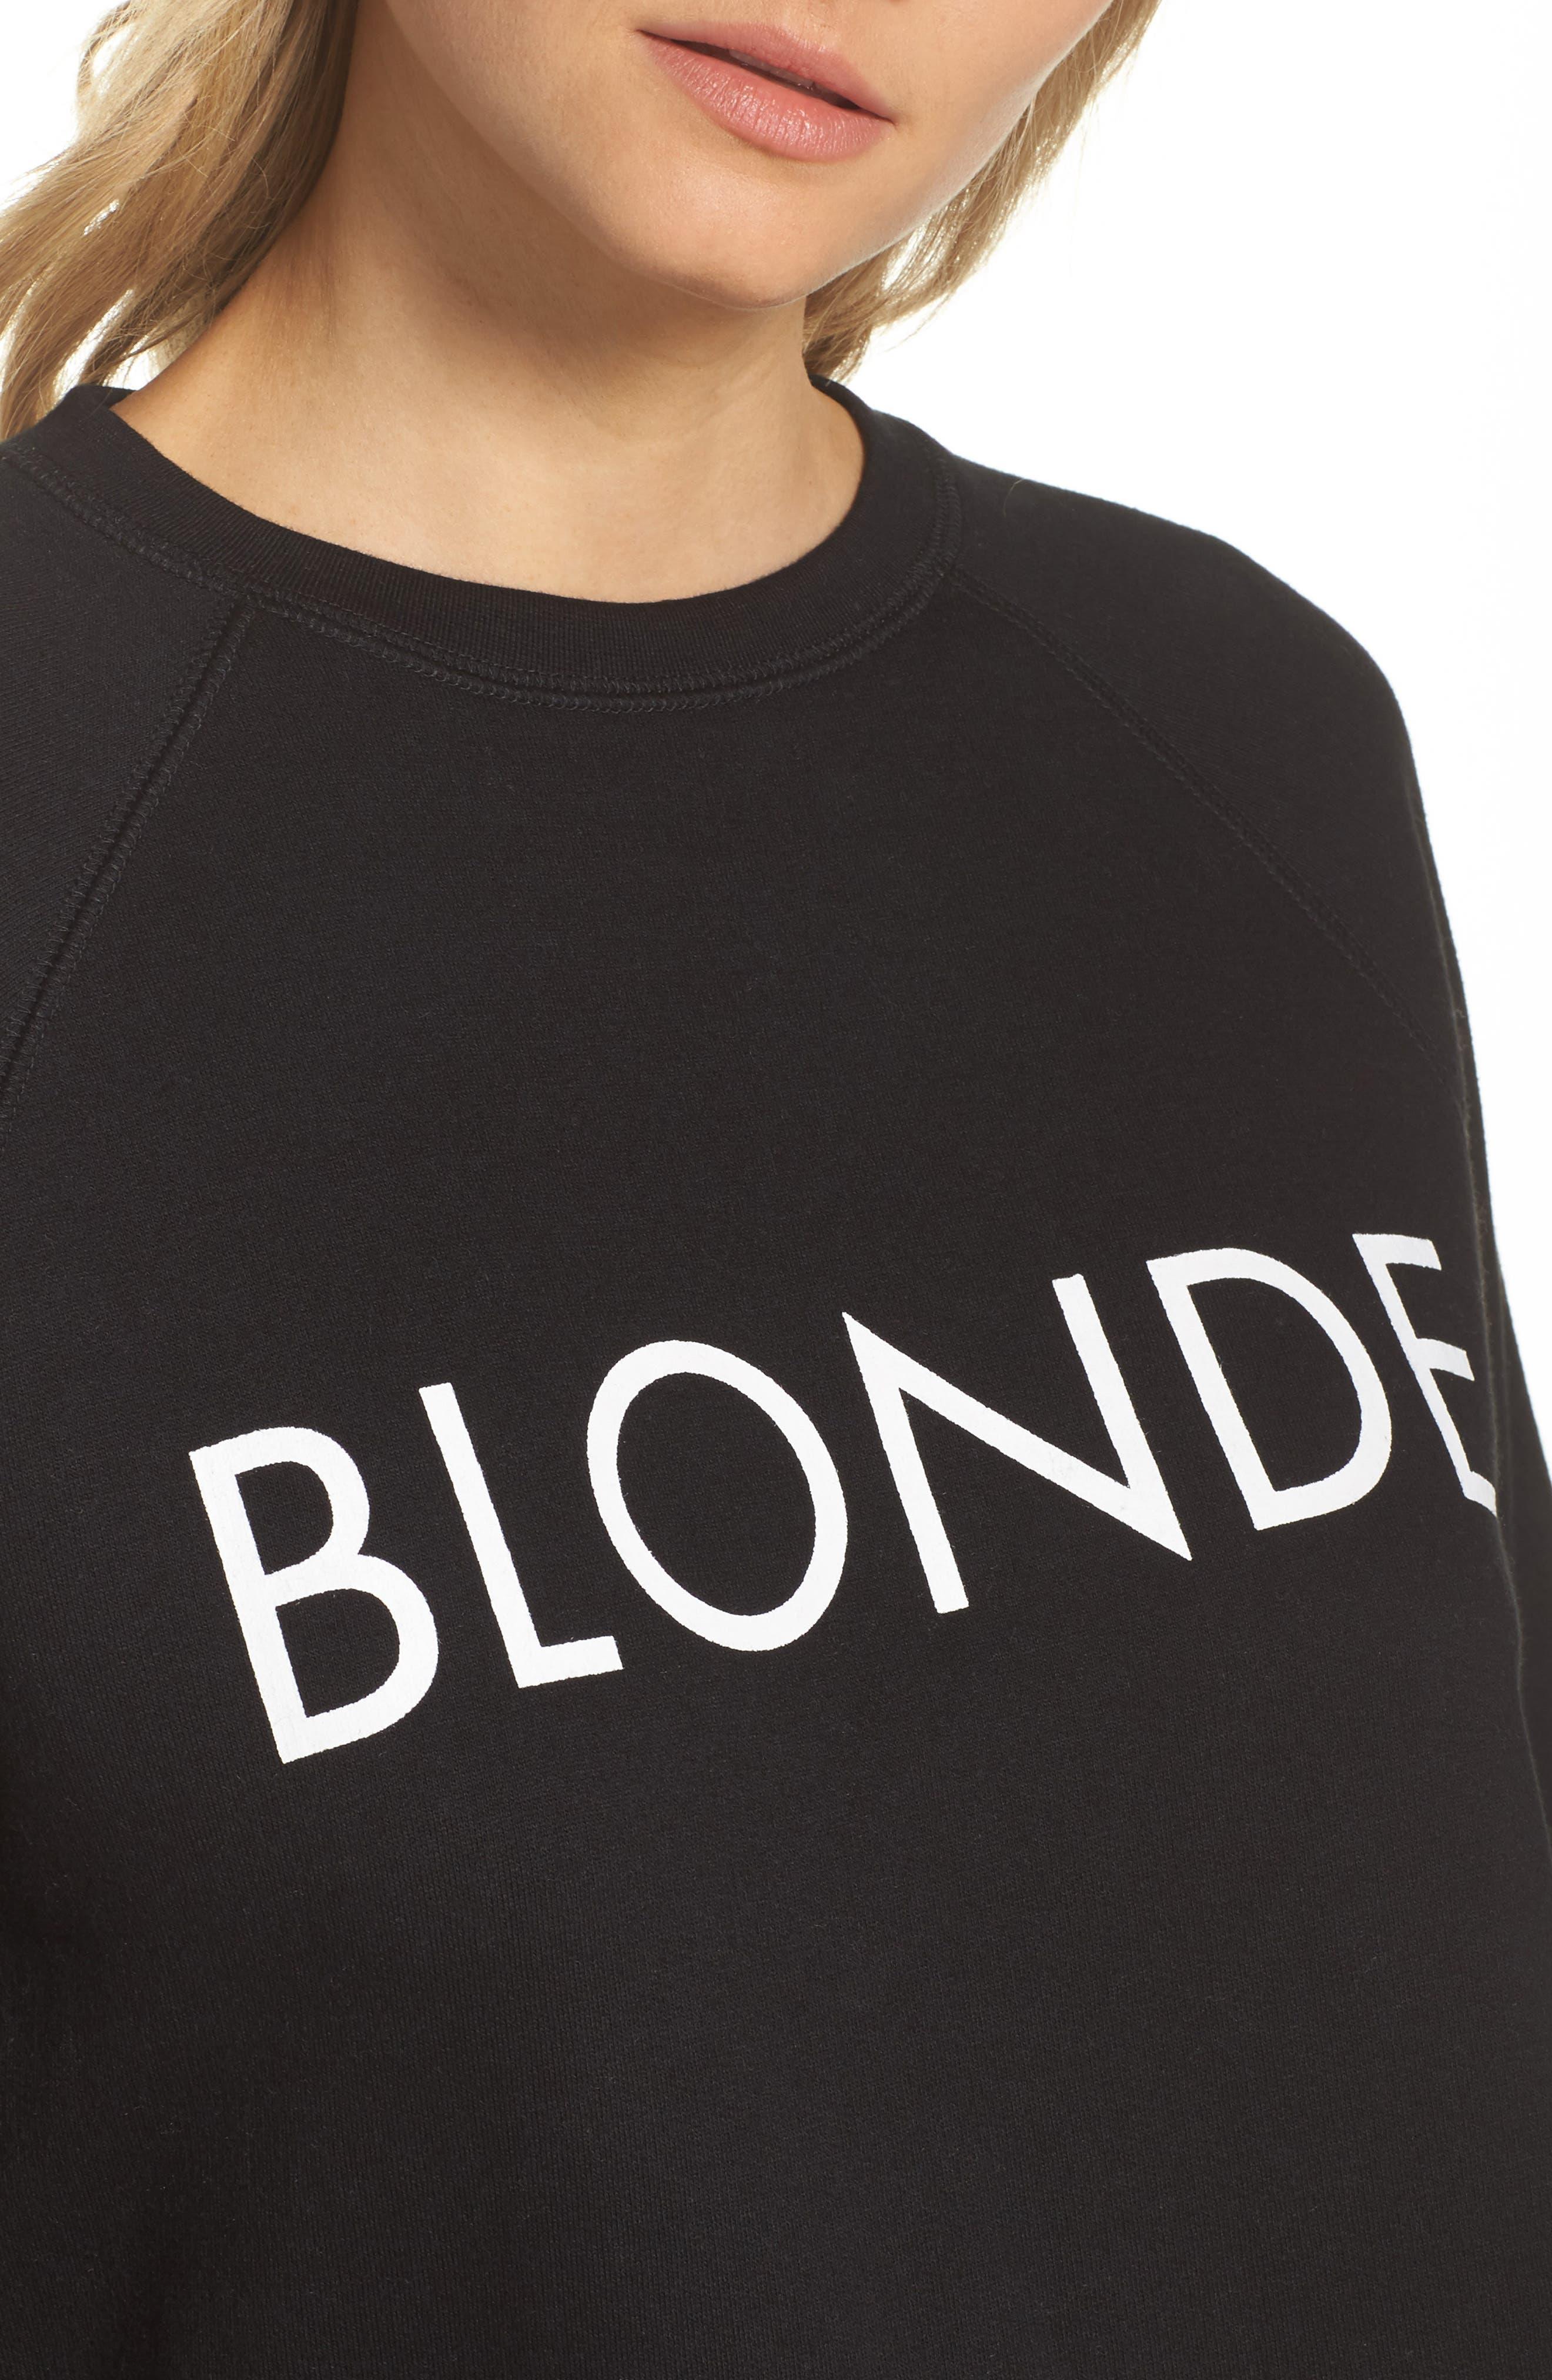 Blonde Raw Hem Sweatshirt,                             Alternate thumbnail 4, color,                             005